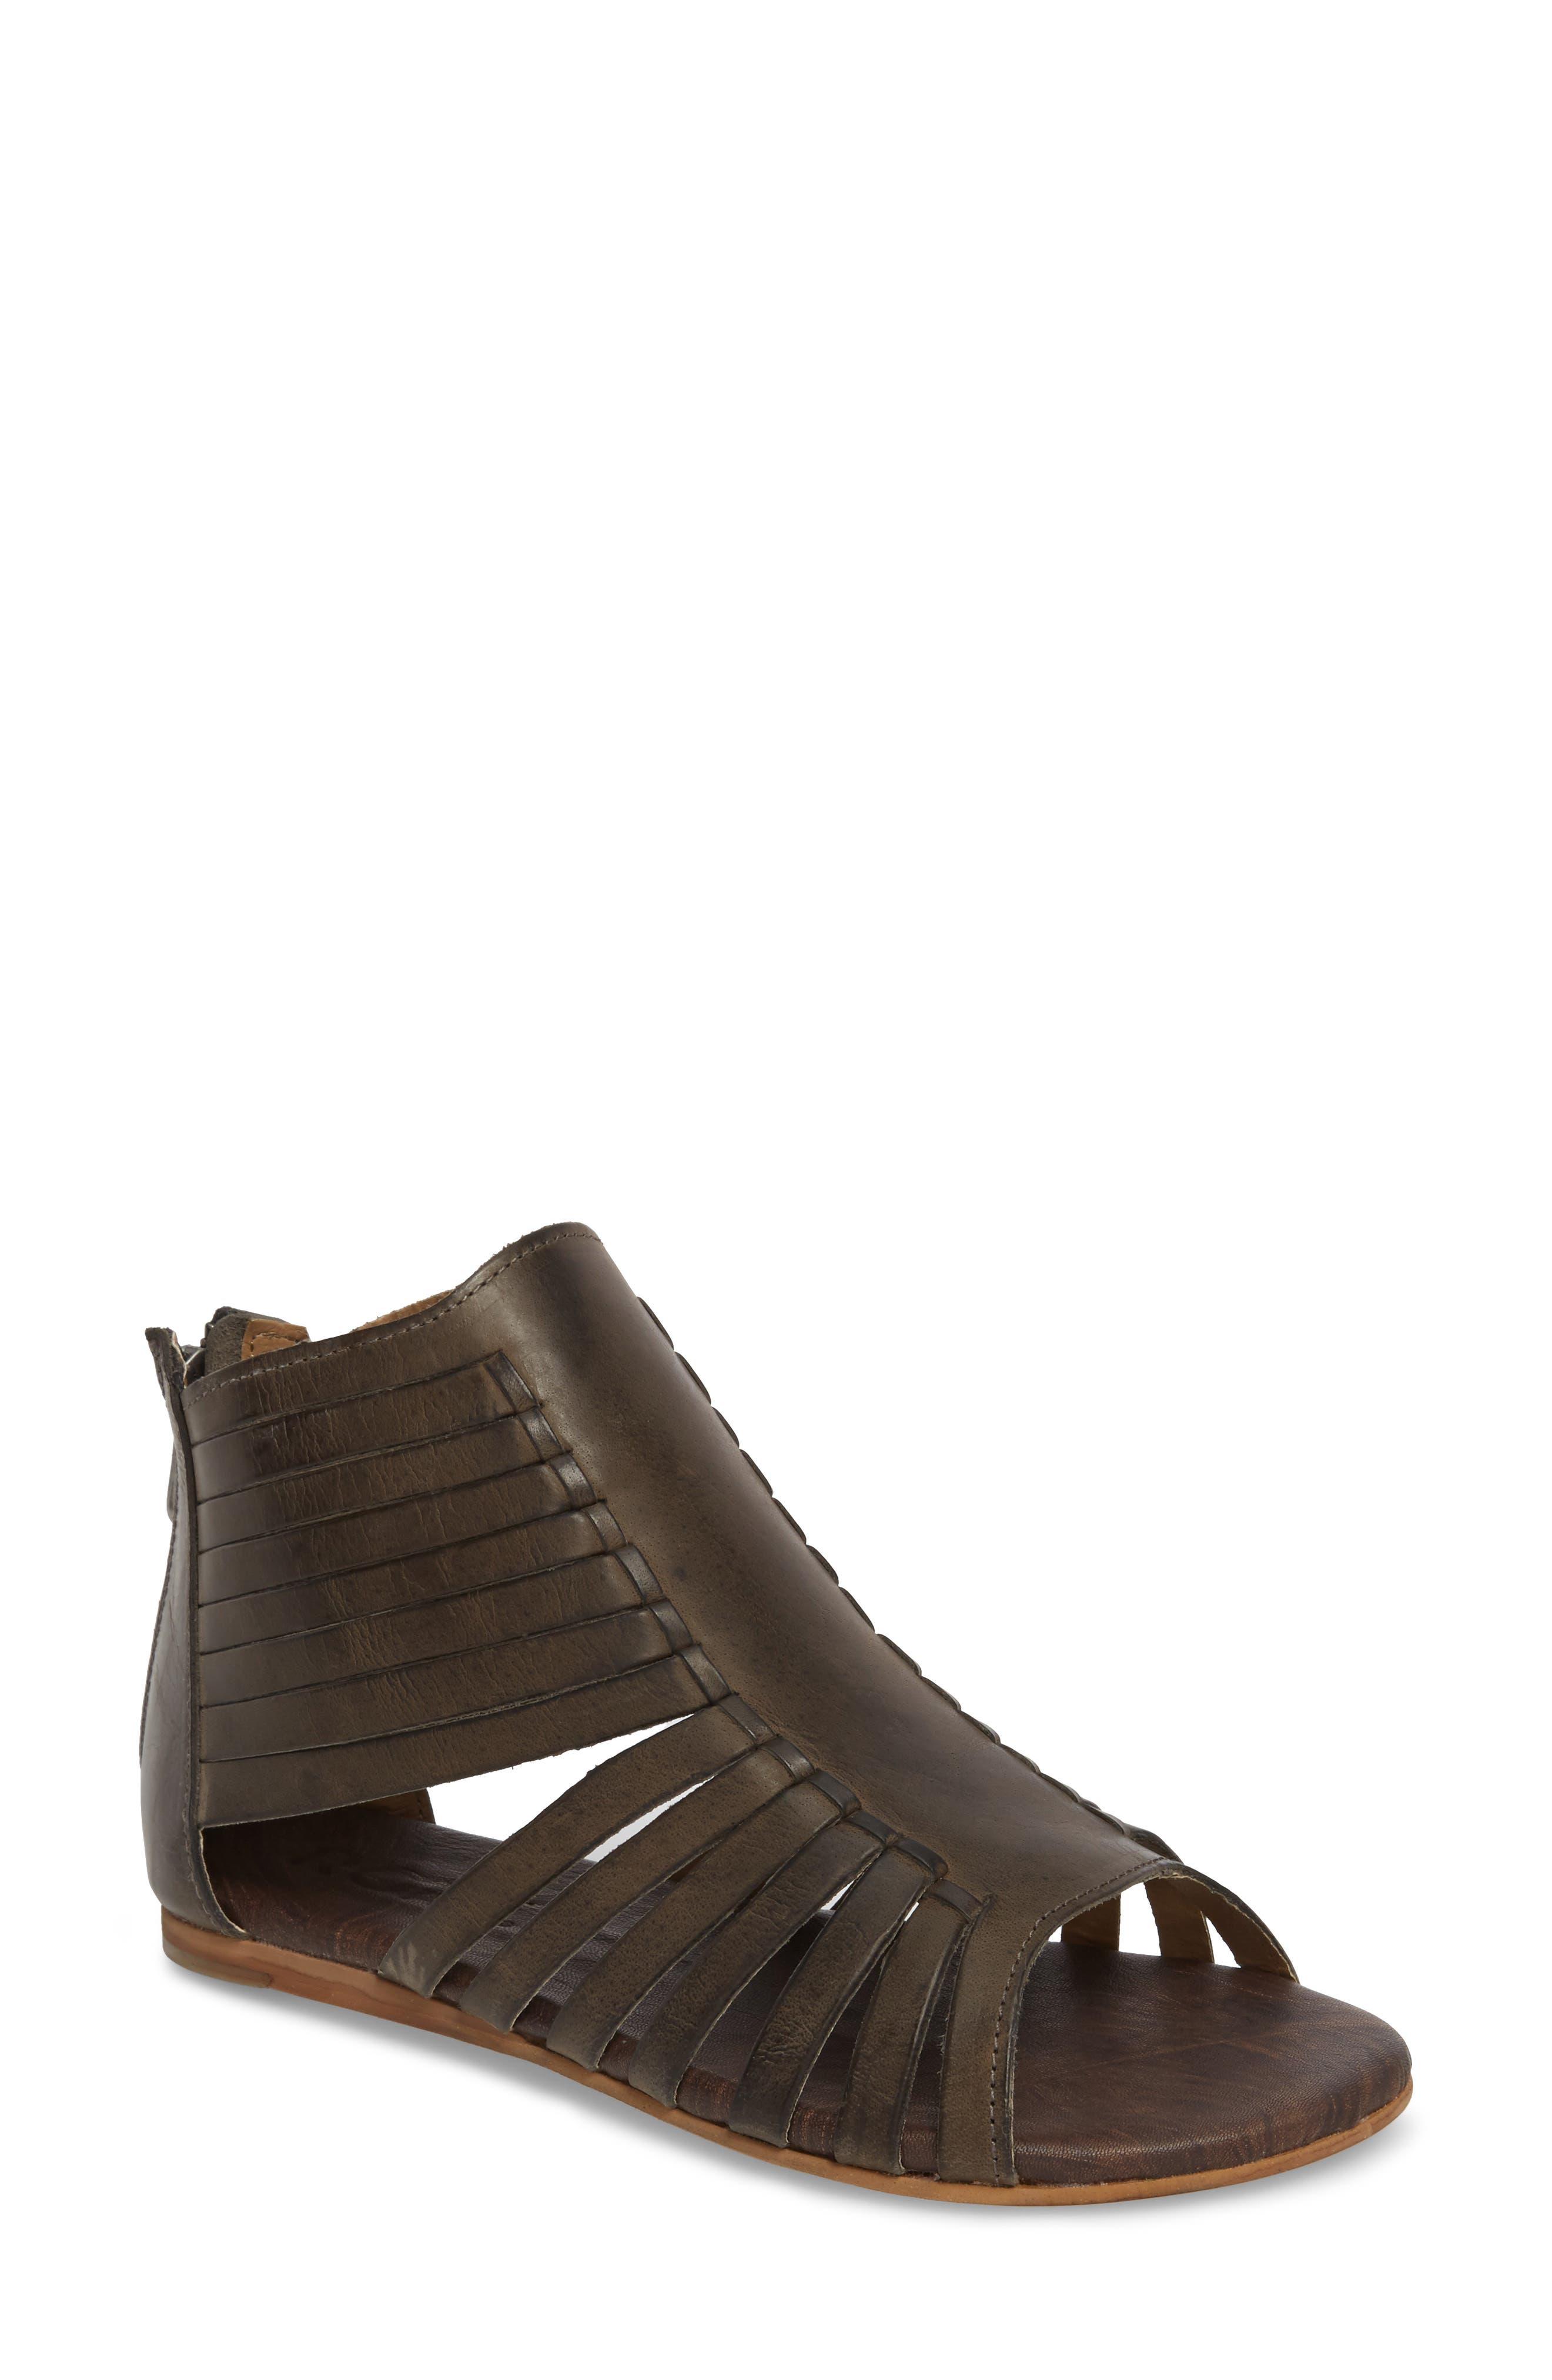 Pearl Gladiator Sandal,                         Main,                         color, BLACK GREENLAND